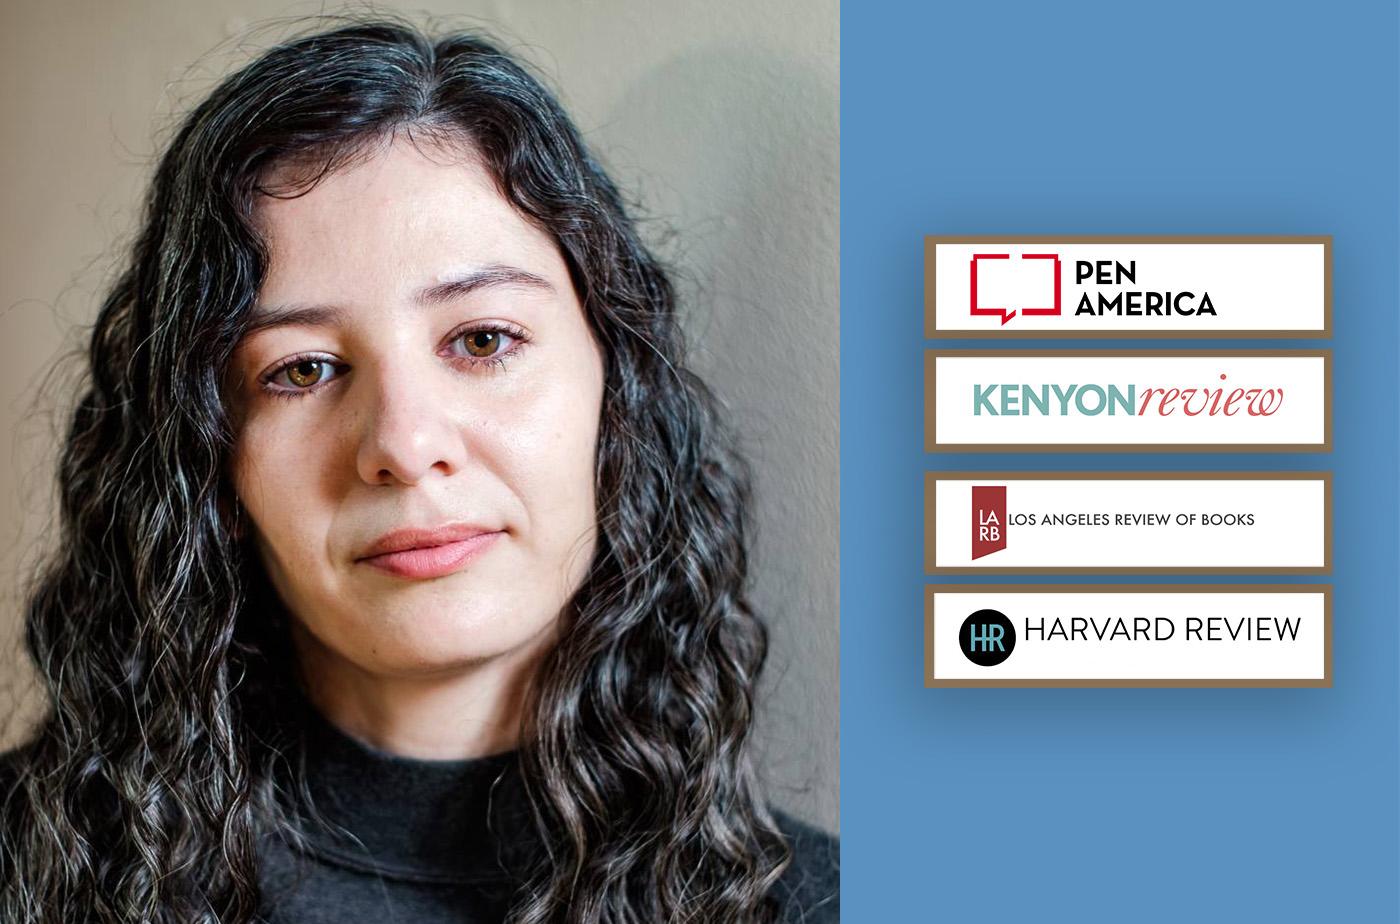 Catapult online classes: Bruna Dantas Lobato, 6-Week Online Open-Genre Workshop: The Art of Translation, Fiction, Nonfiction, Workshop